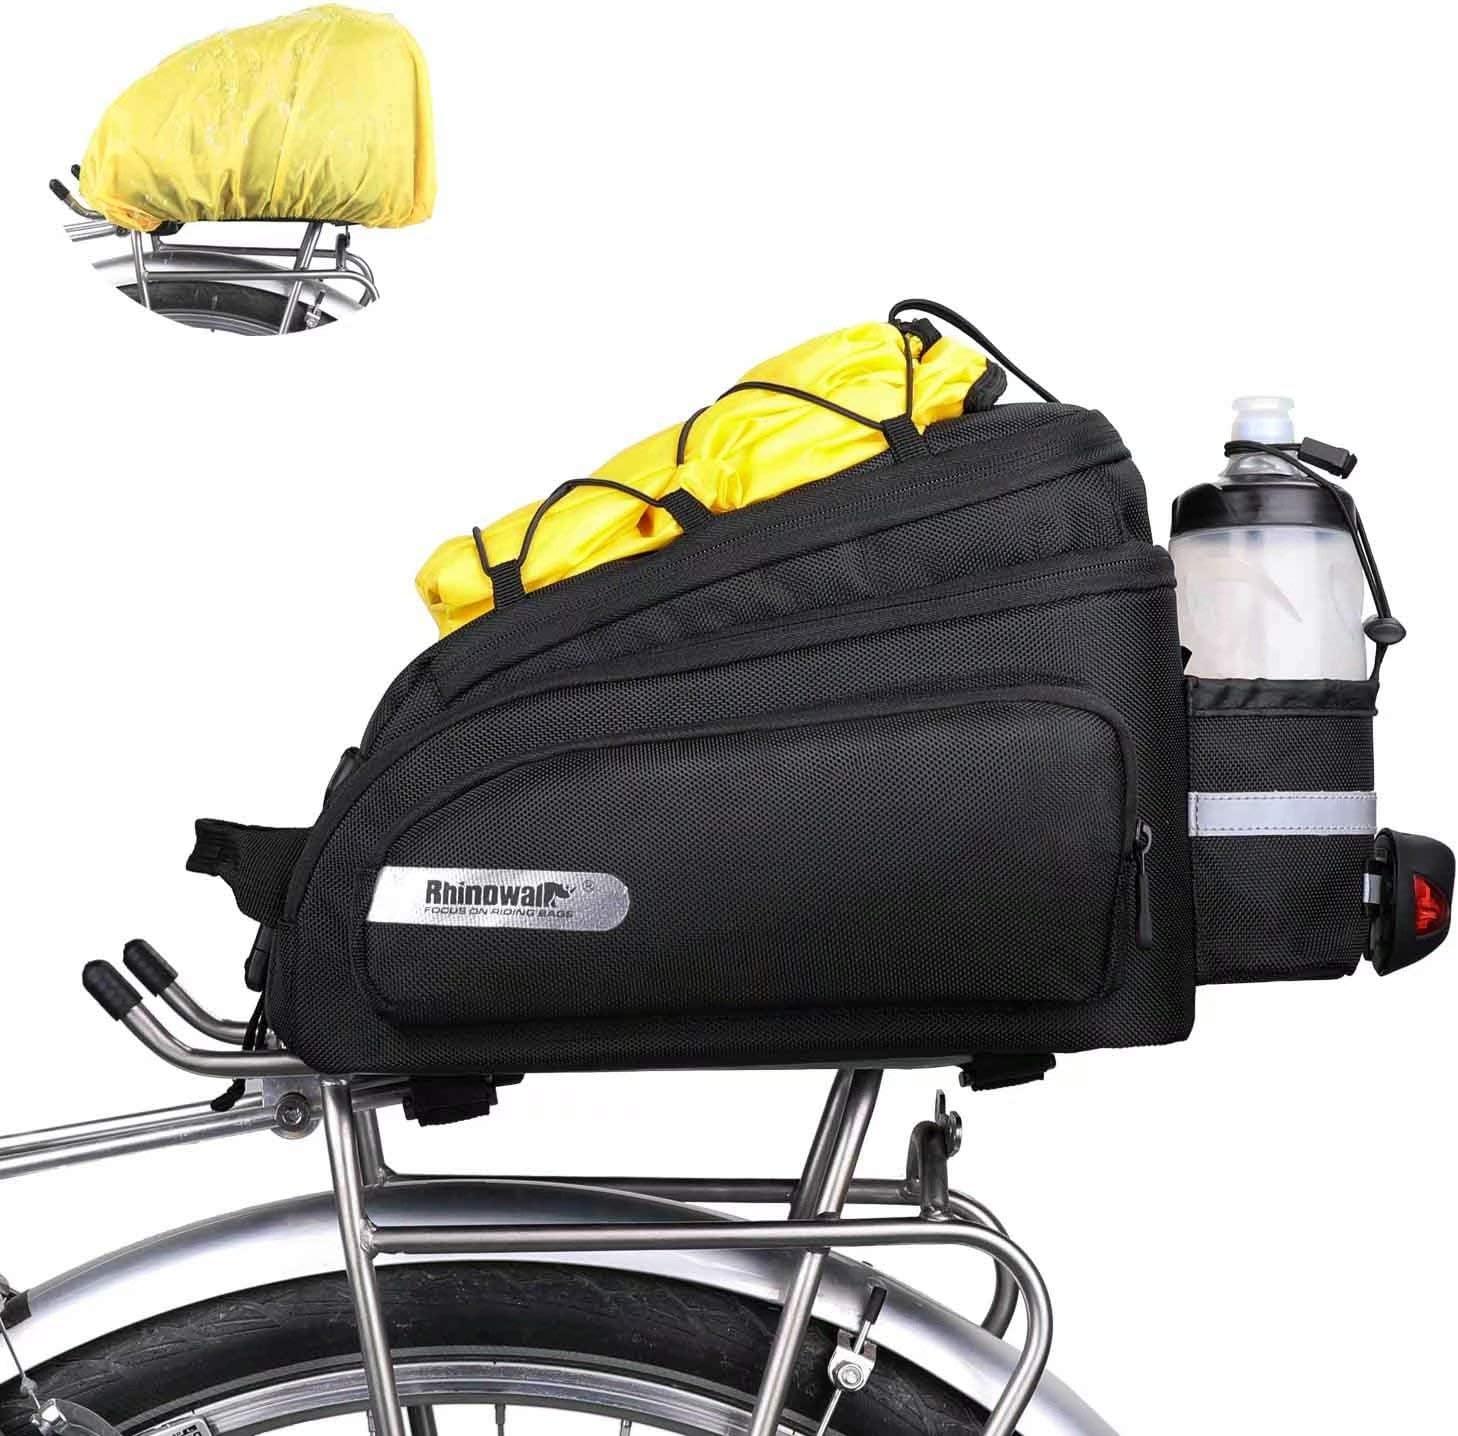 LOCALLION 12L Bike Trunk Bag Bicycle Rack Bag Bike Rear Seat Cargo Bag Bicycle Rack Trunk Panniers Bicycle Rear Rack Storage Luggage